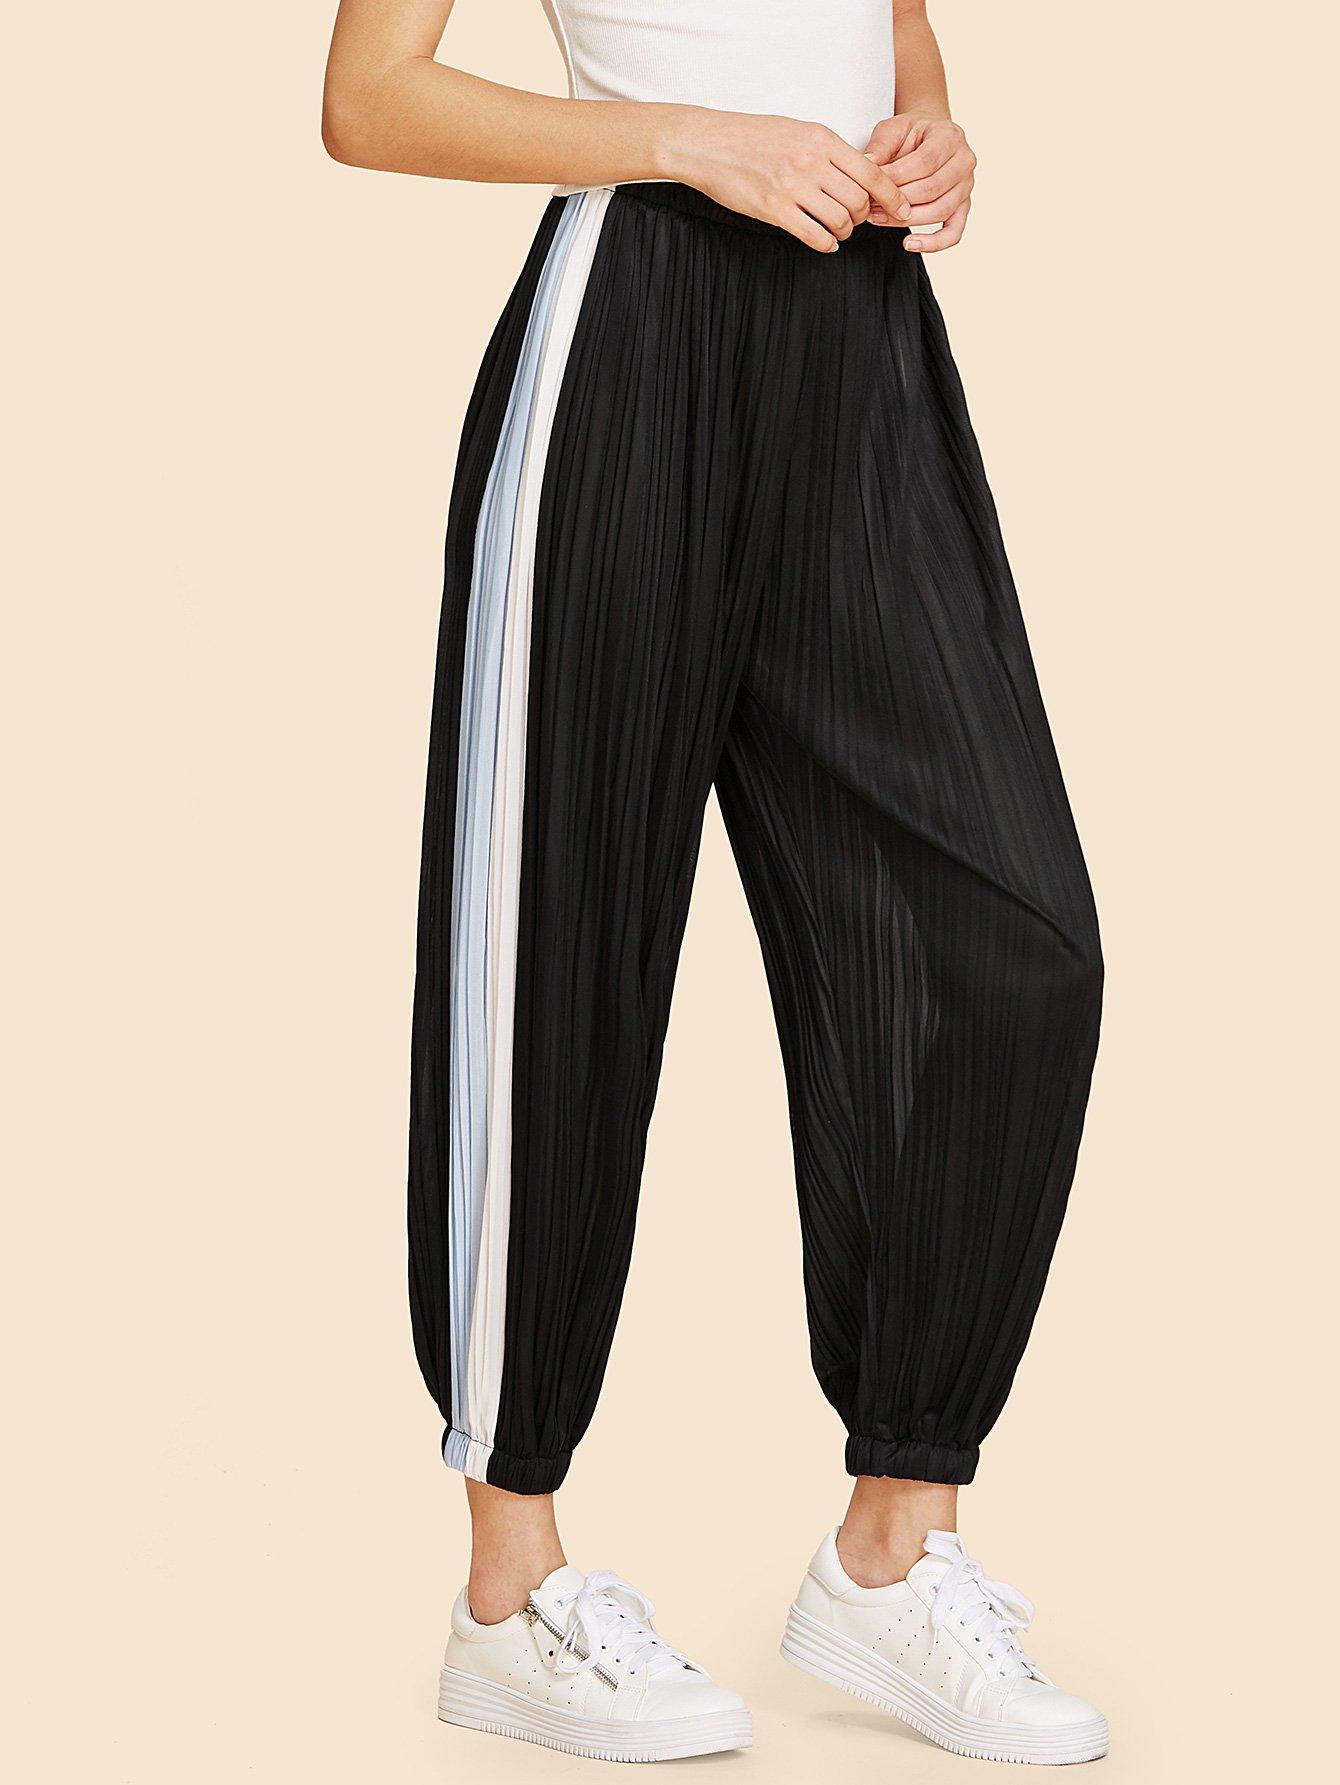 Contrast Panel Side Pleated Harem Pants contrast panel side pleated harem pants